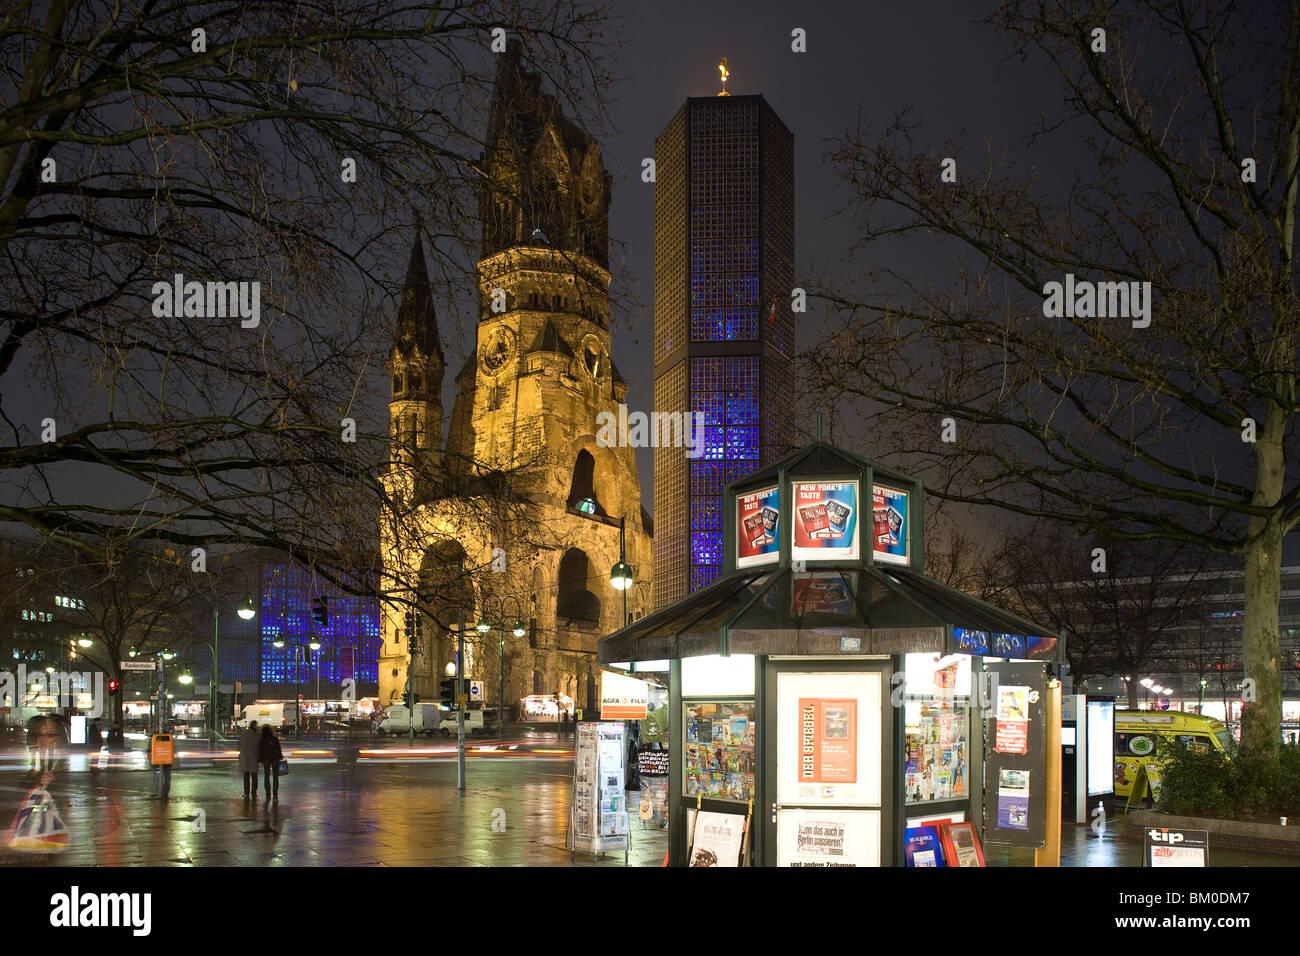 Kaiser Wilhelm Memorial Church, Breitscheidplatz, Berlin, Germany, Europe - Stock Image